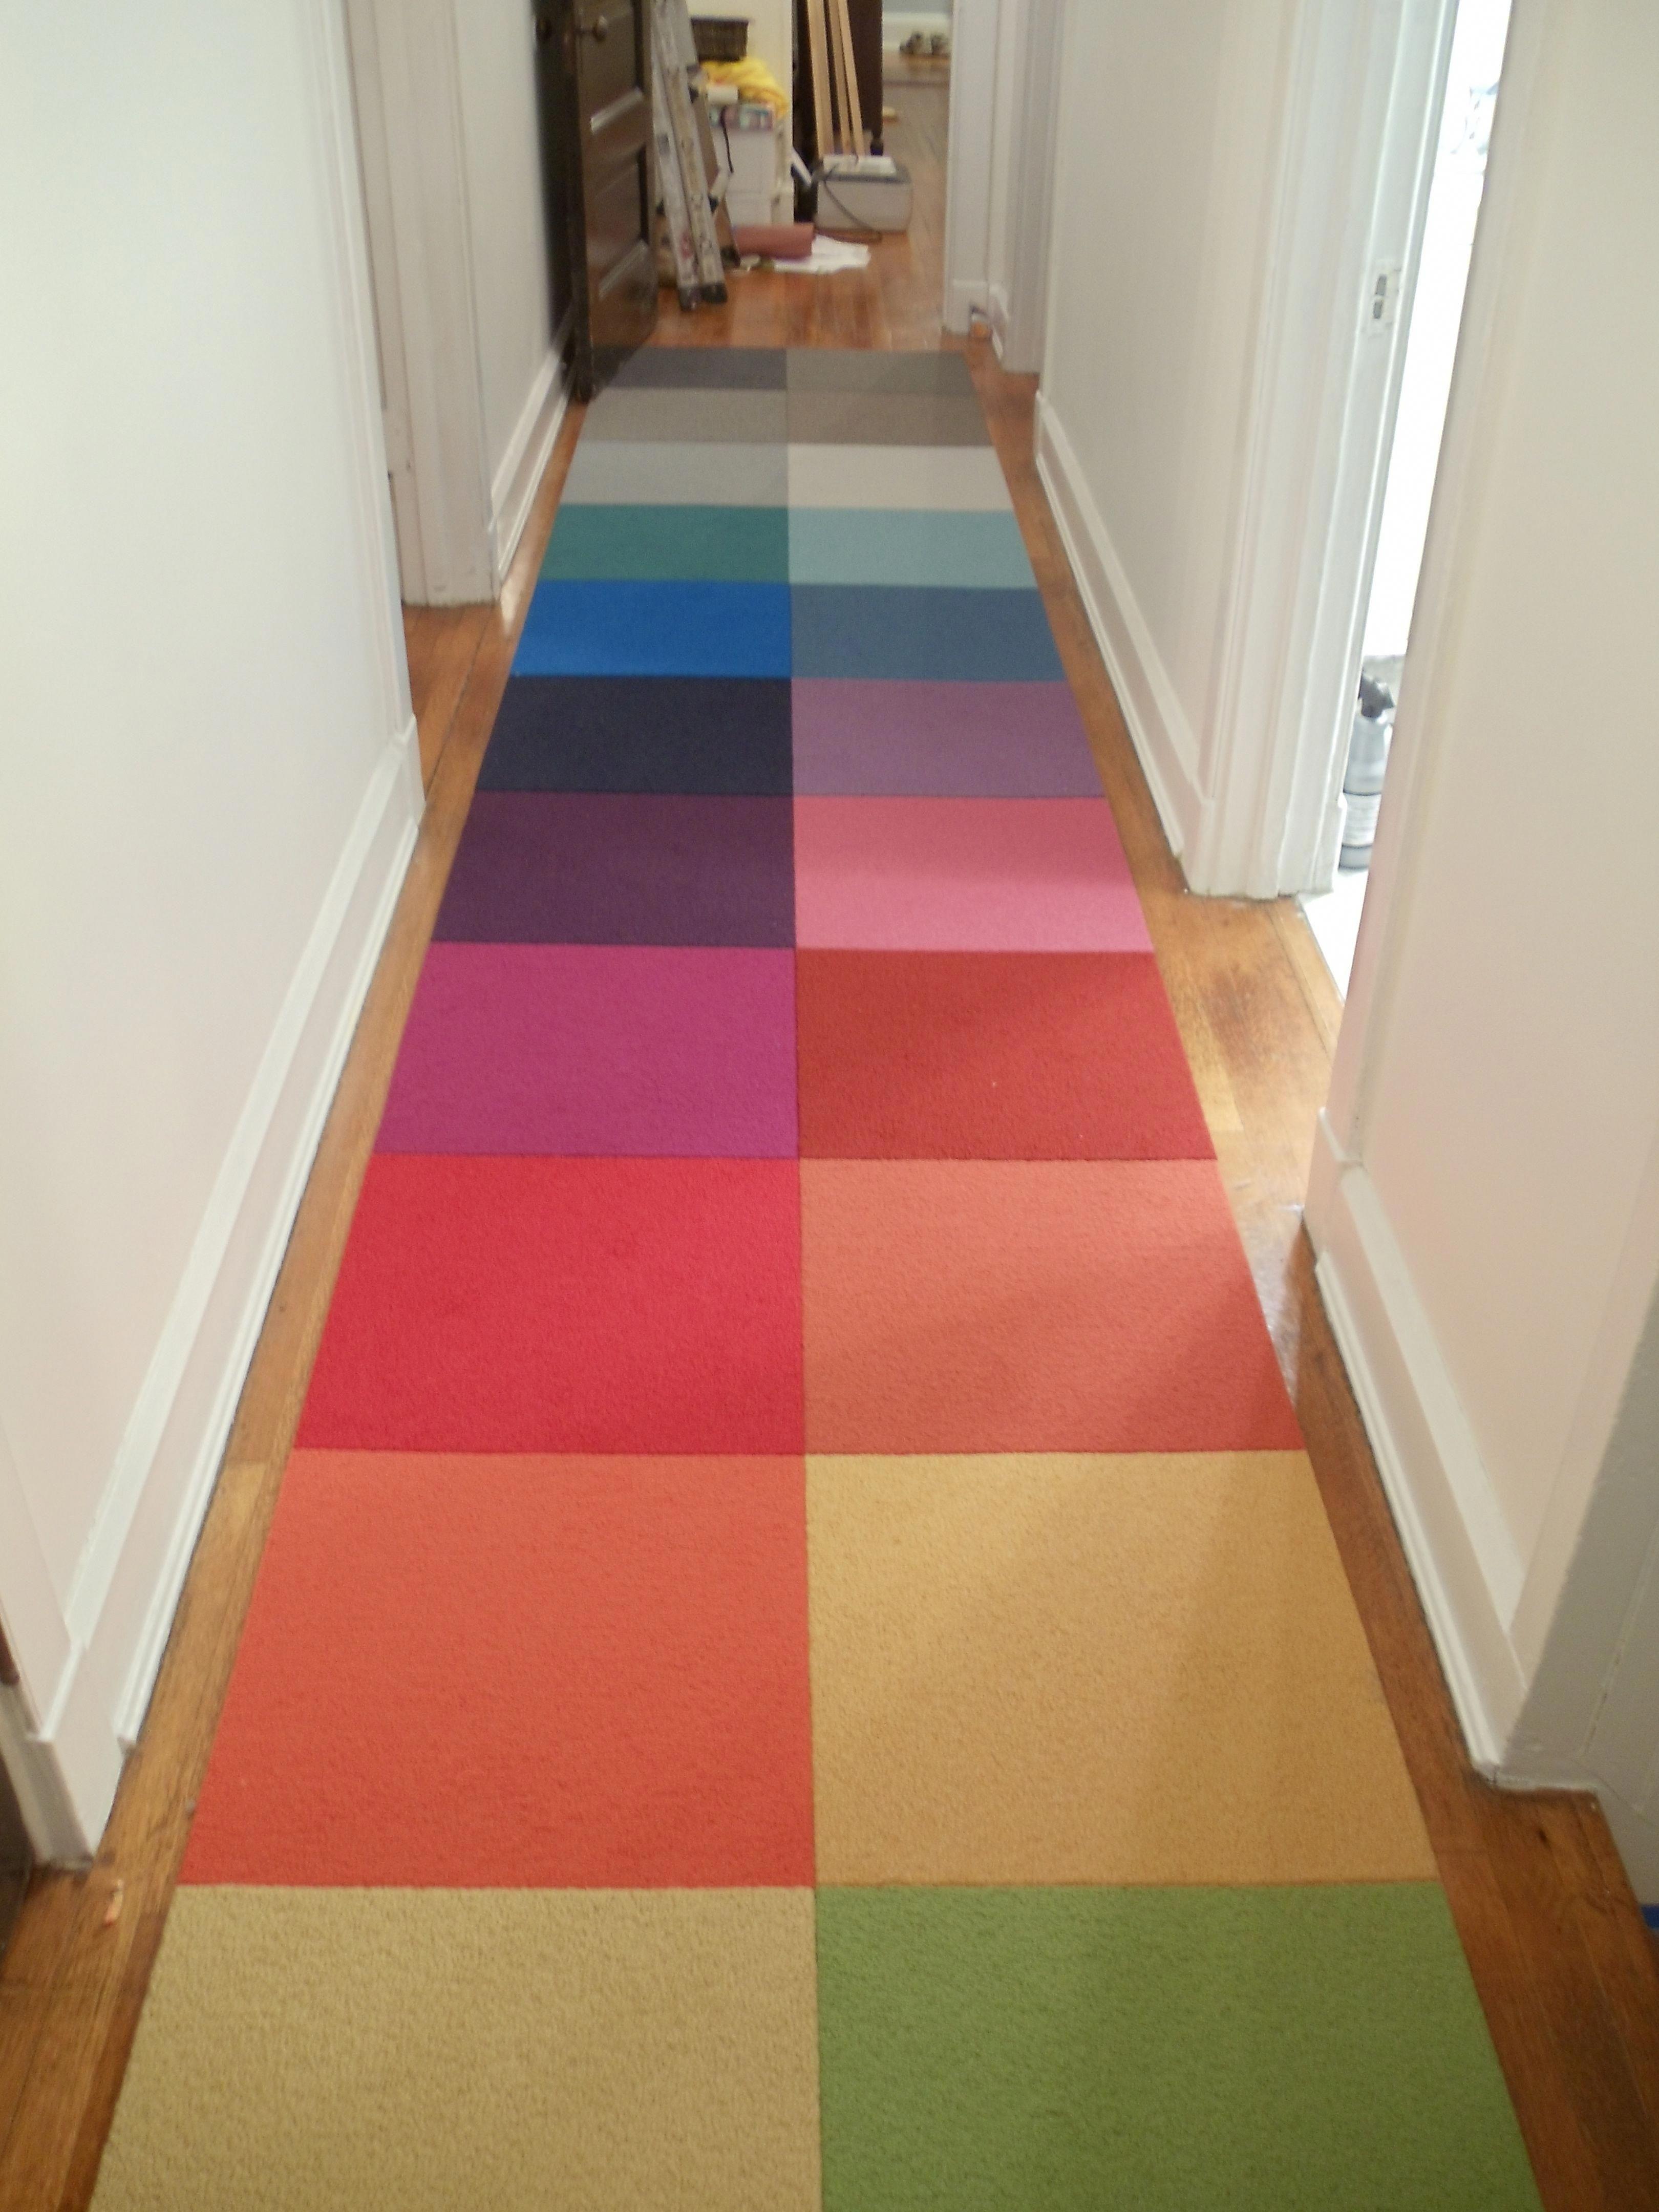 Best Way To Clean Carpet Runners Refferal 8260279863